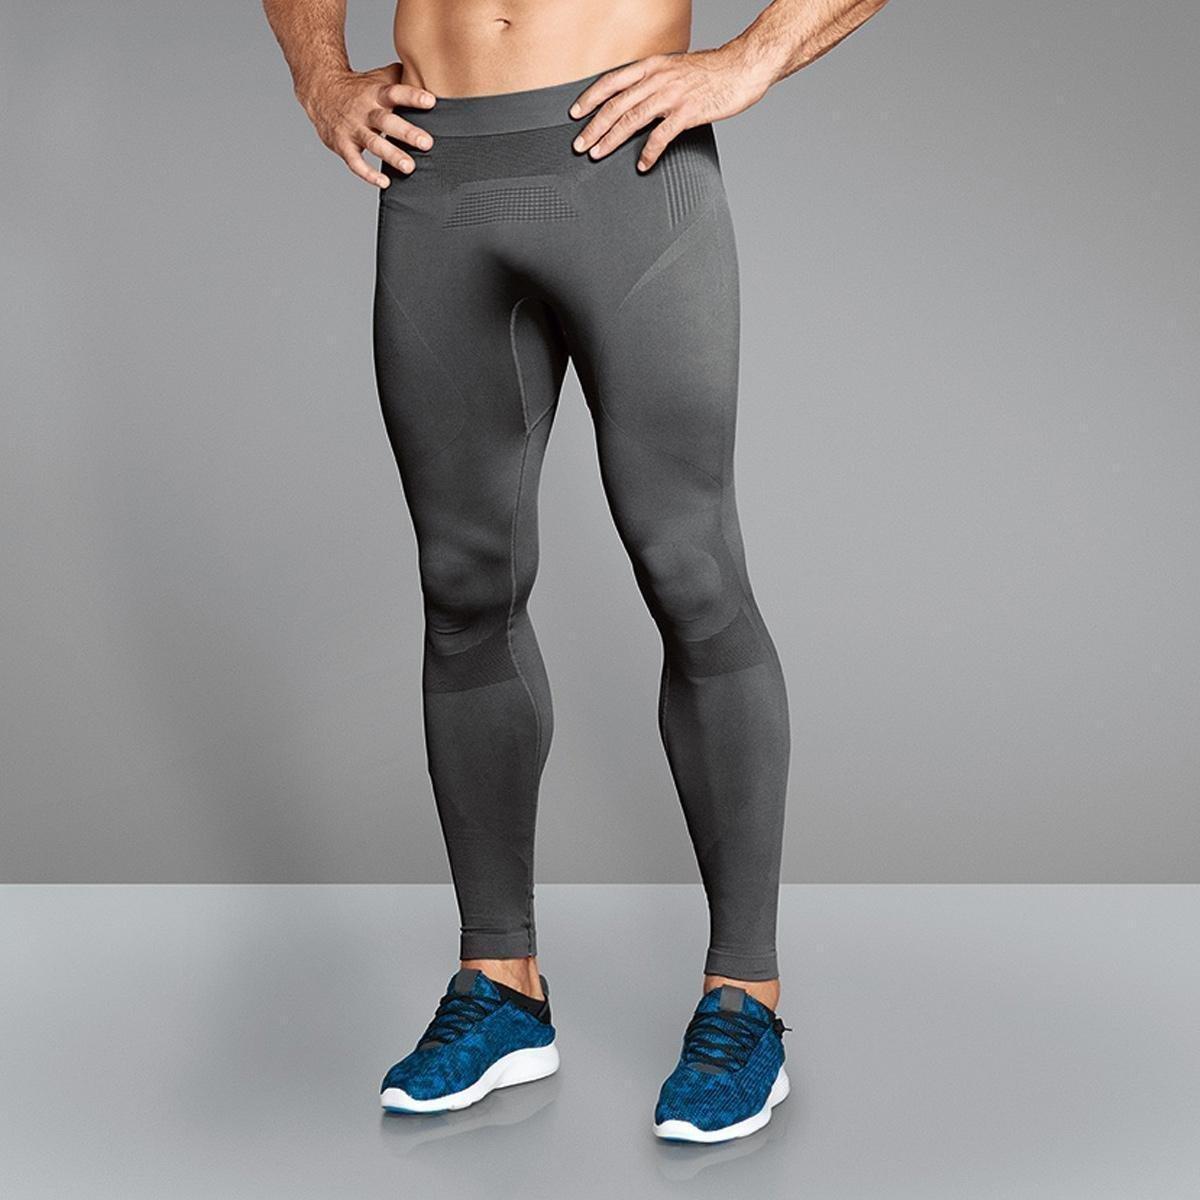 Calça Lupo Sport Térmica X Agora Run Masculina Compre Agora X Netsapatos a7c366